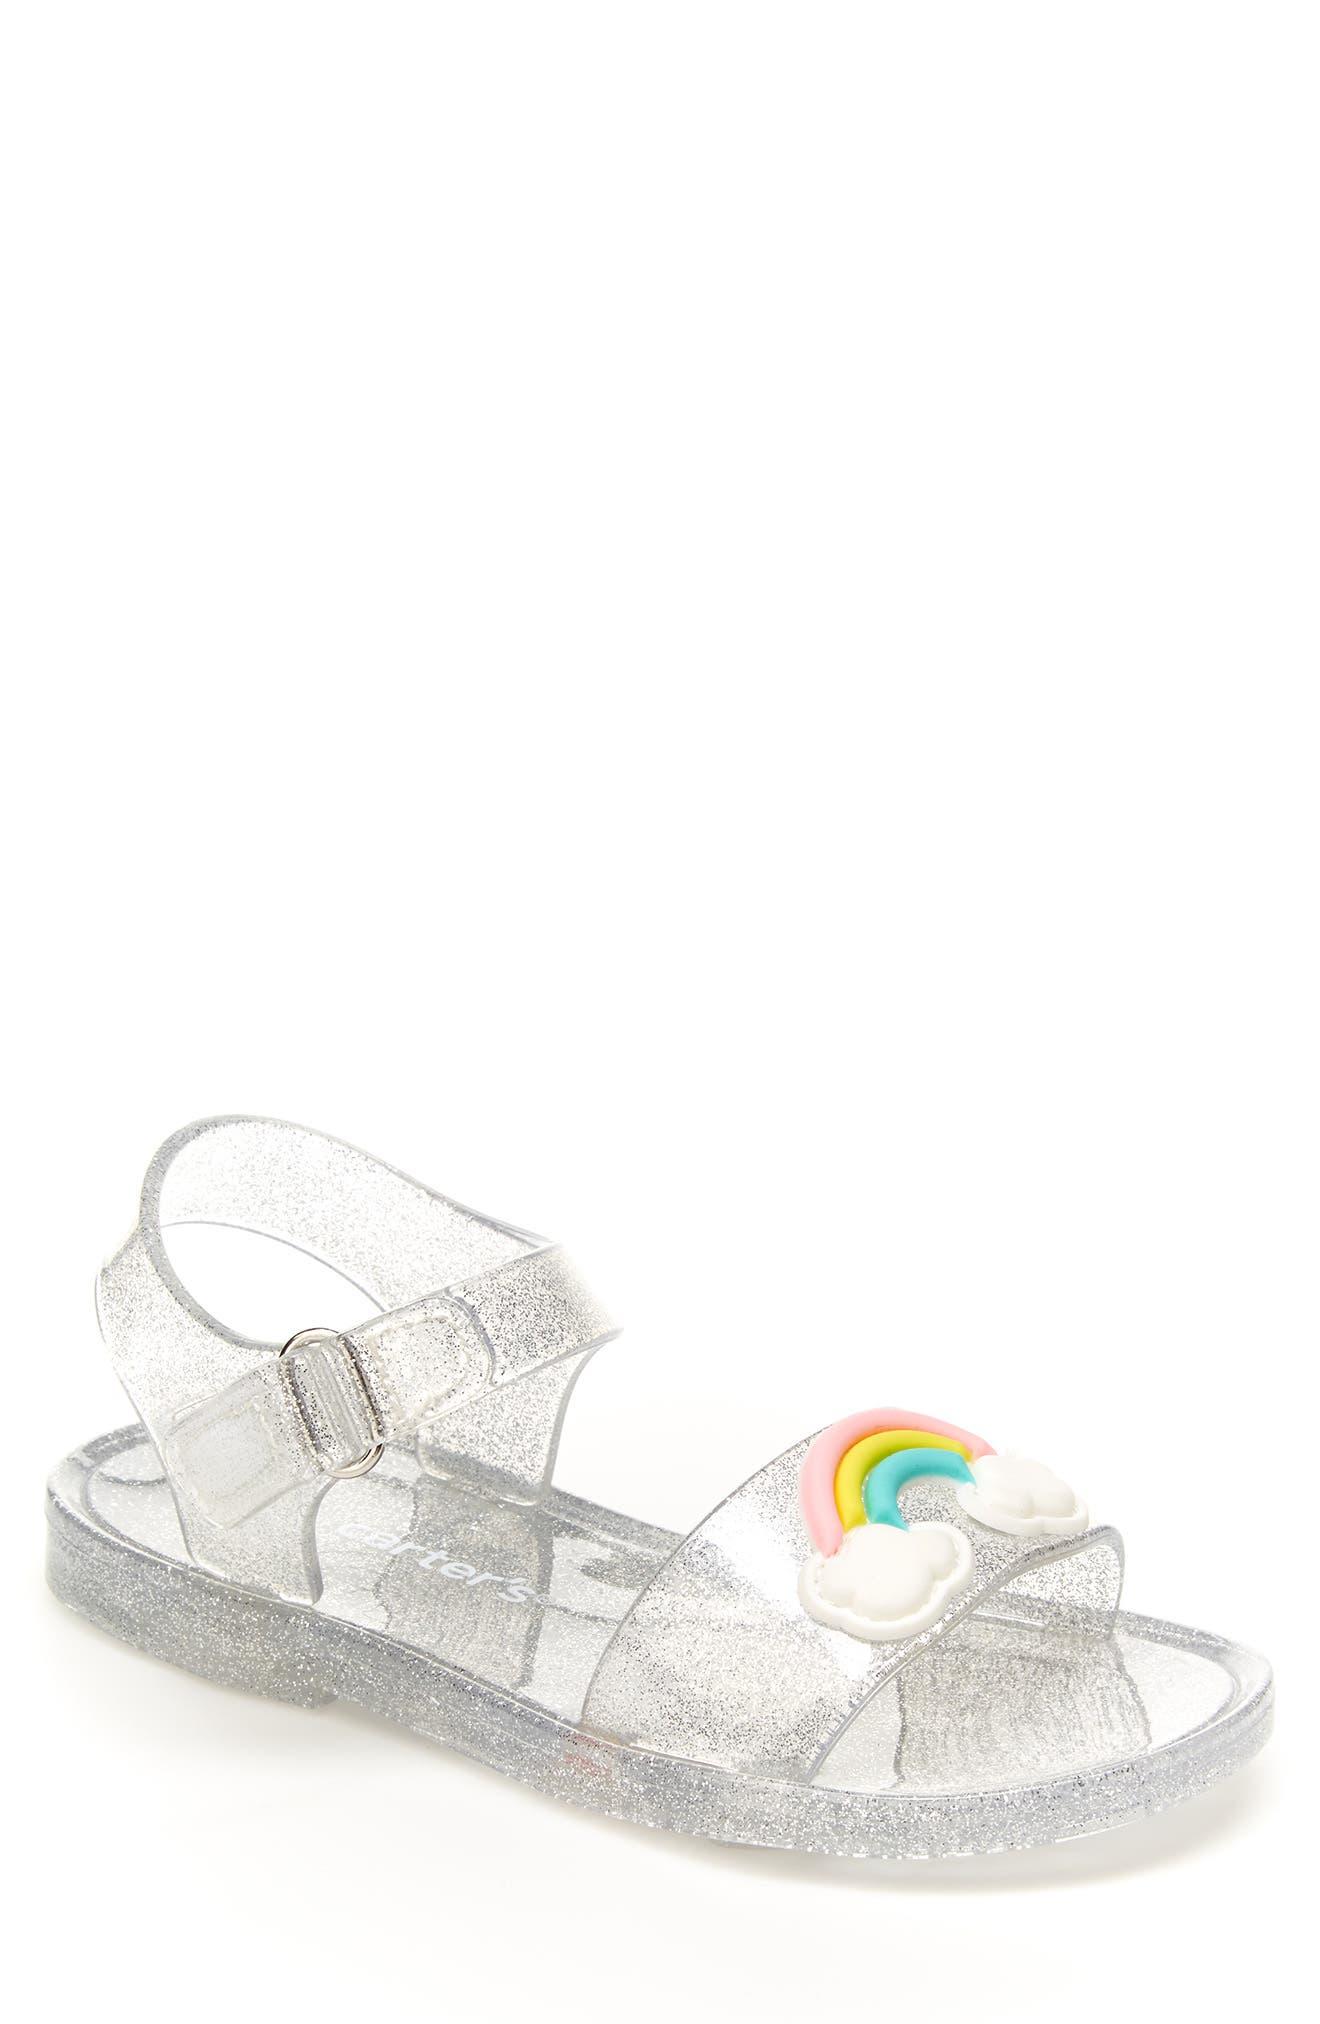 Image of Carter's Iris Clear Rainbow Sandal